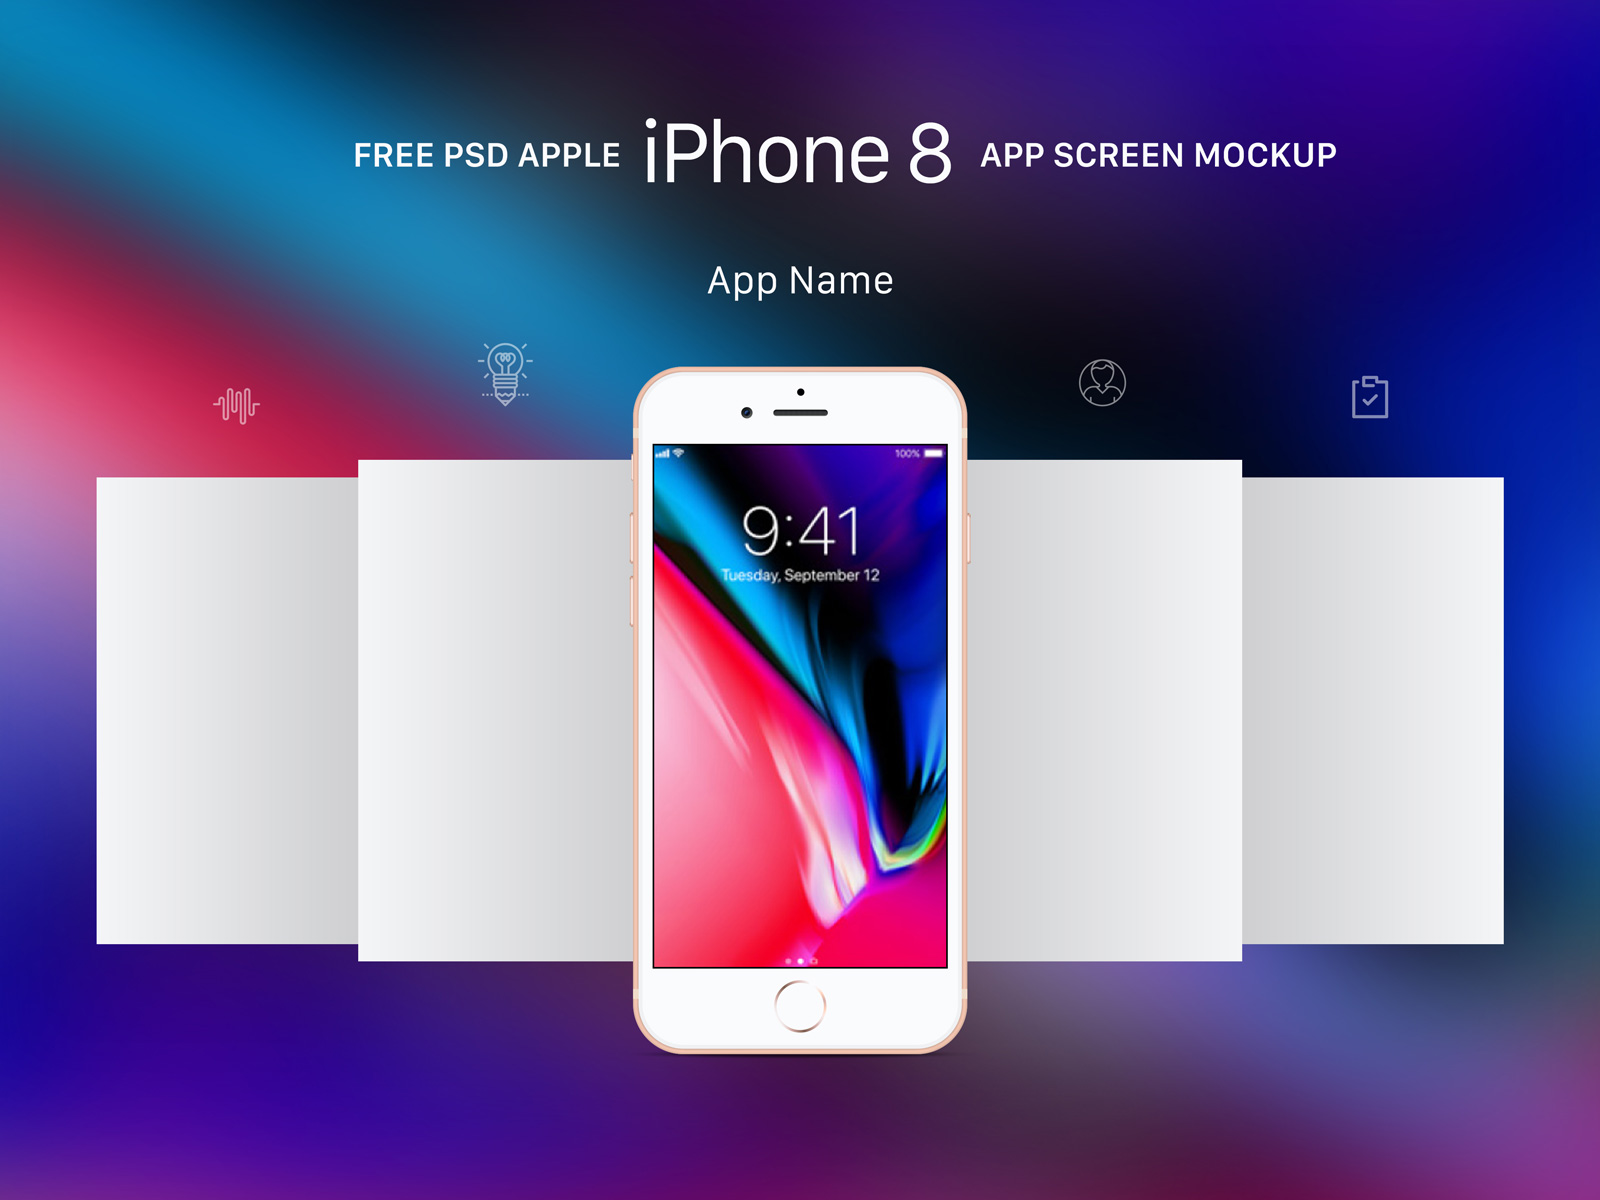 Free-Apple-Gold-iPhone-8-App-Screen-Mockup-PSD